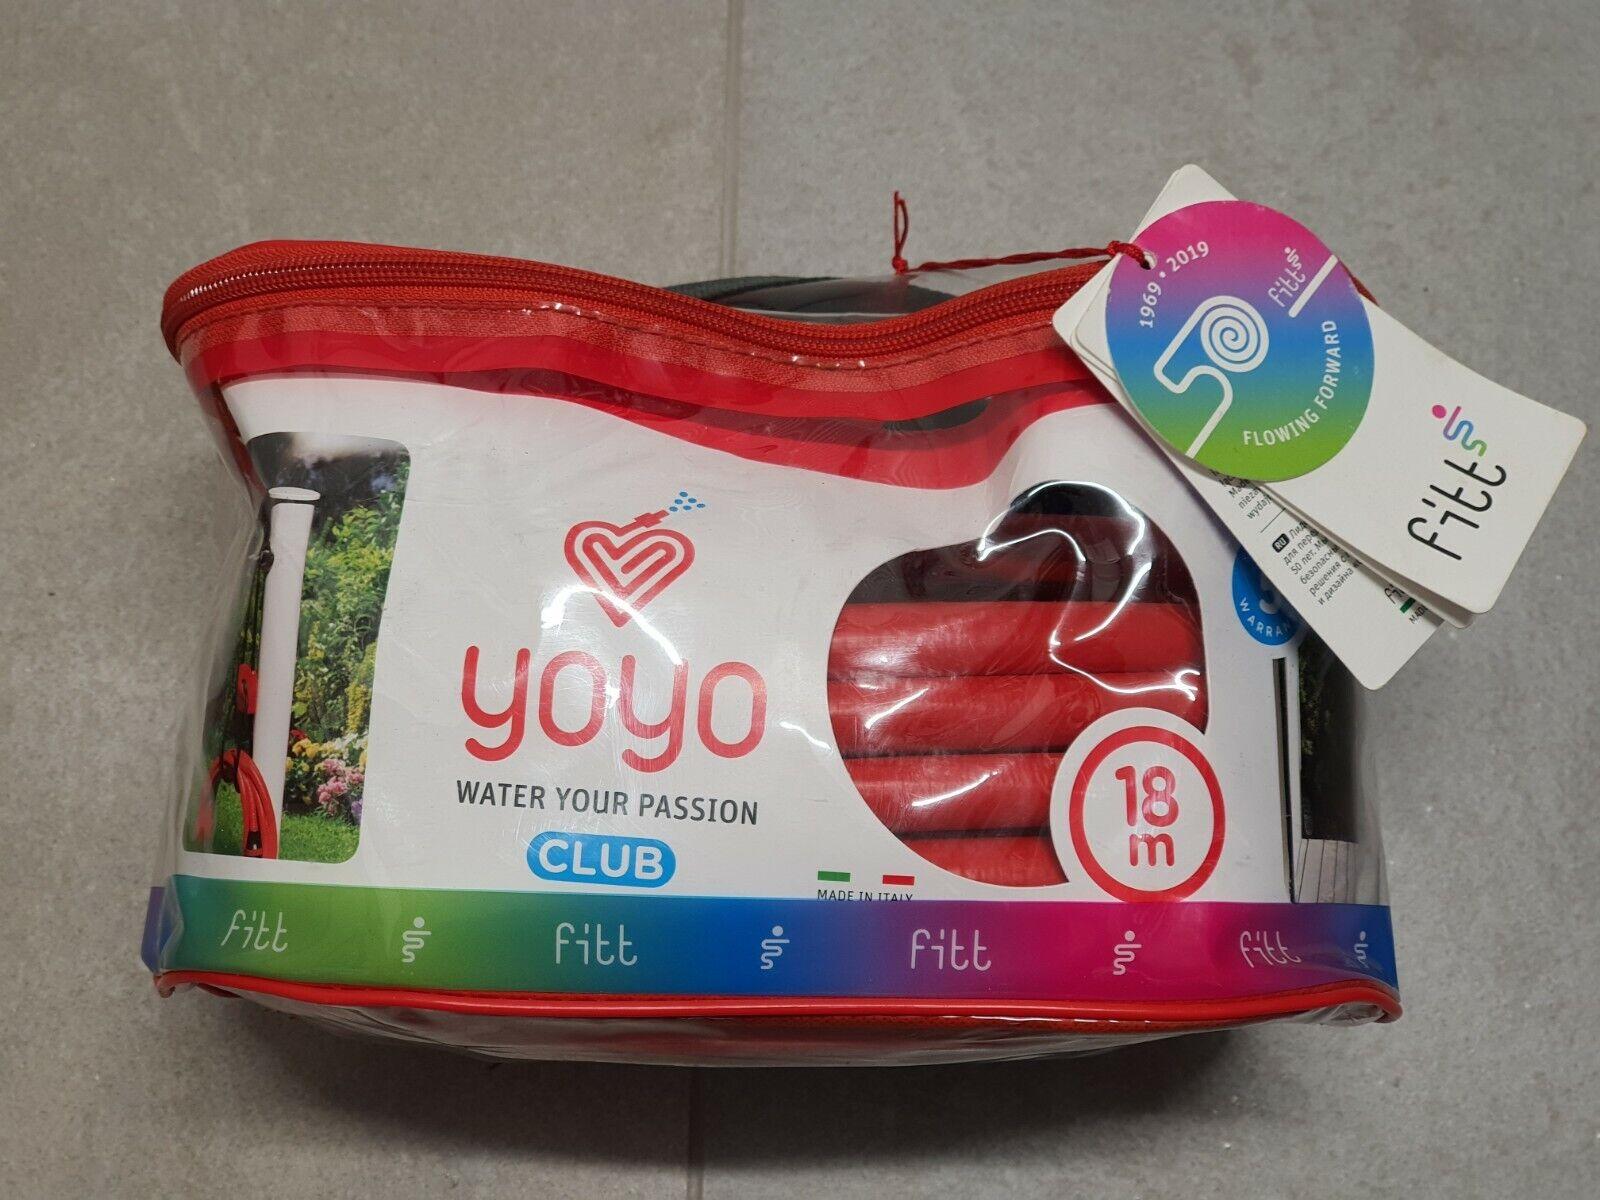 YOYO Expanding Lightweight Garden Watering Soft Hose with Spray Gun 18m - New